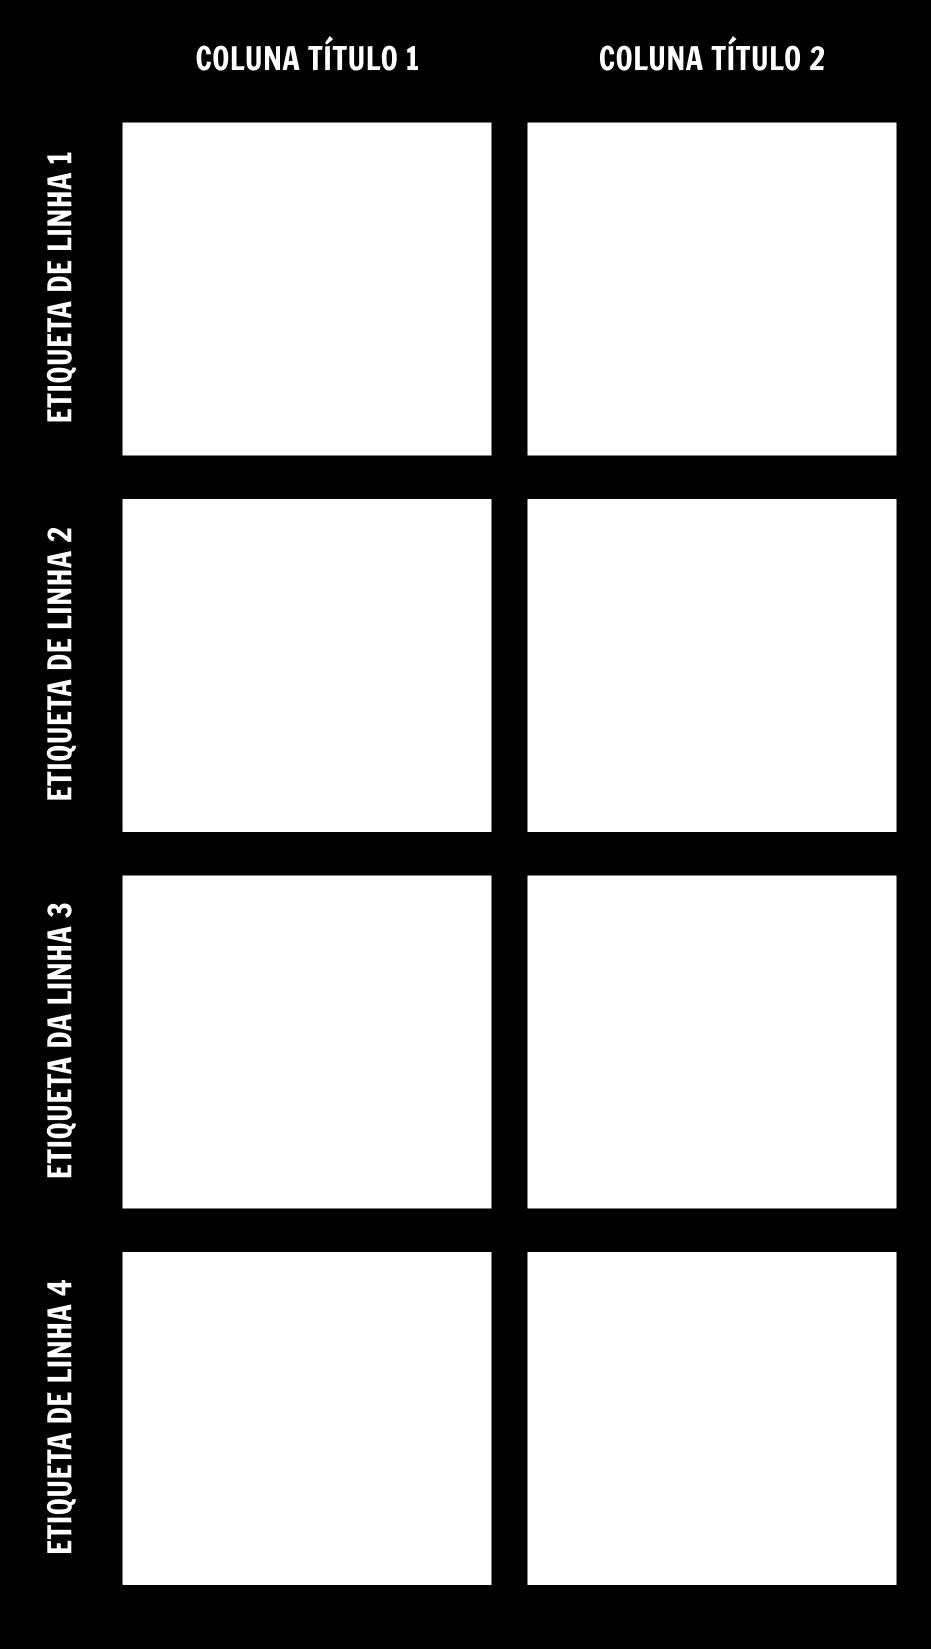 Grafico 2x4 Em Branco Storyboard Por Pt Examples